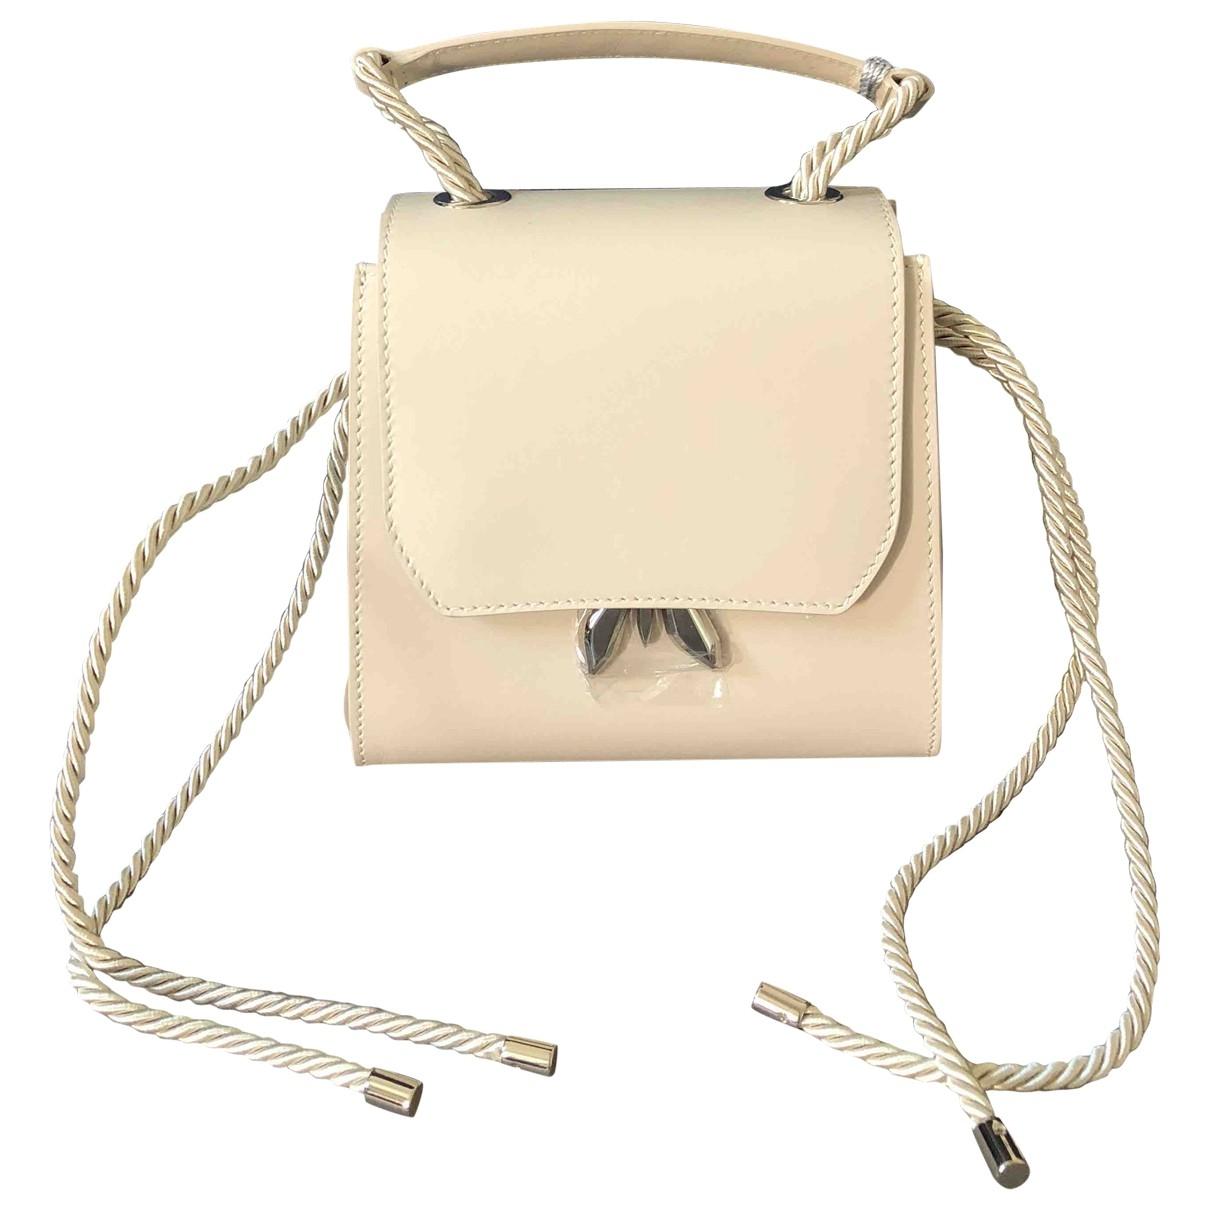 Patrizia Pepe \N Handtasche in  Beige Leder